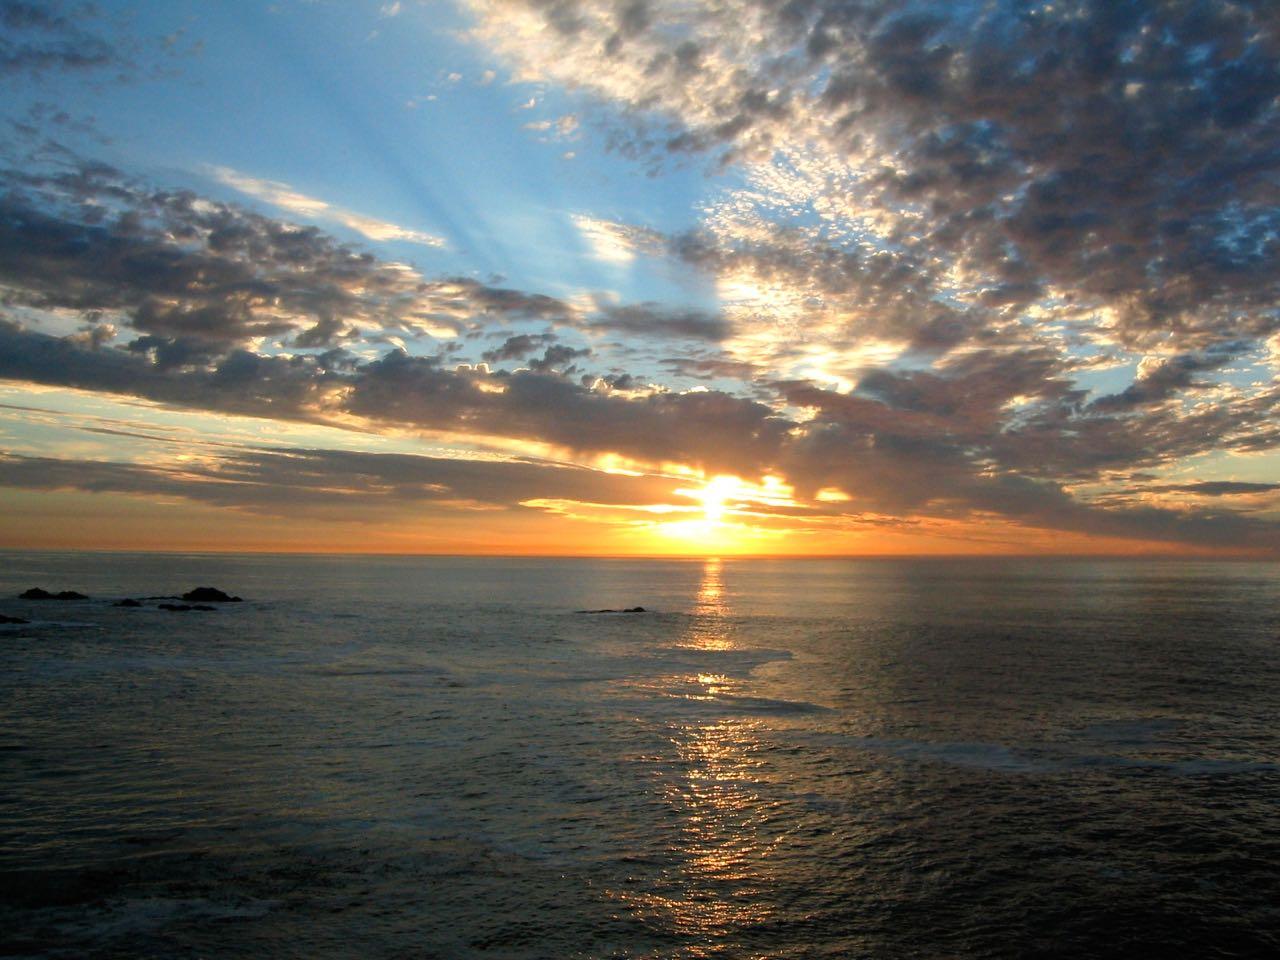 Northern California coast line near Pt. Lobos